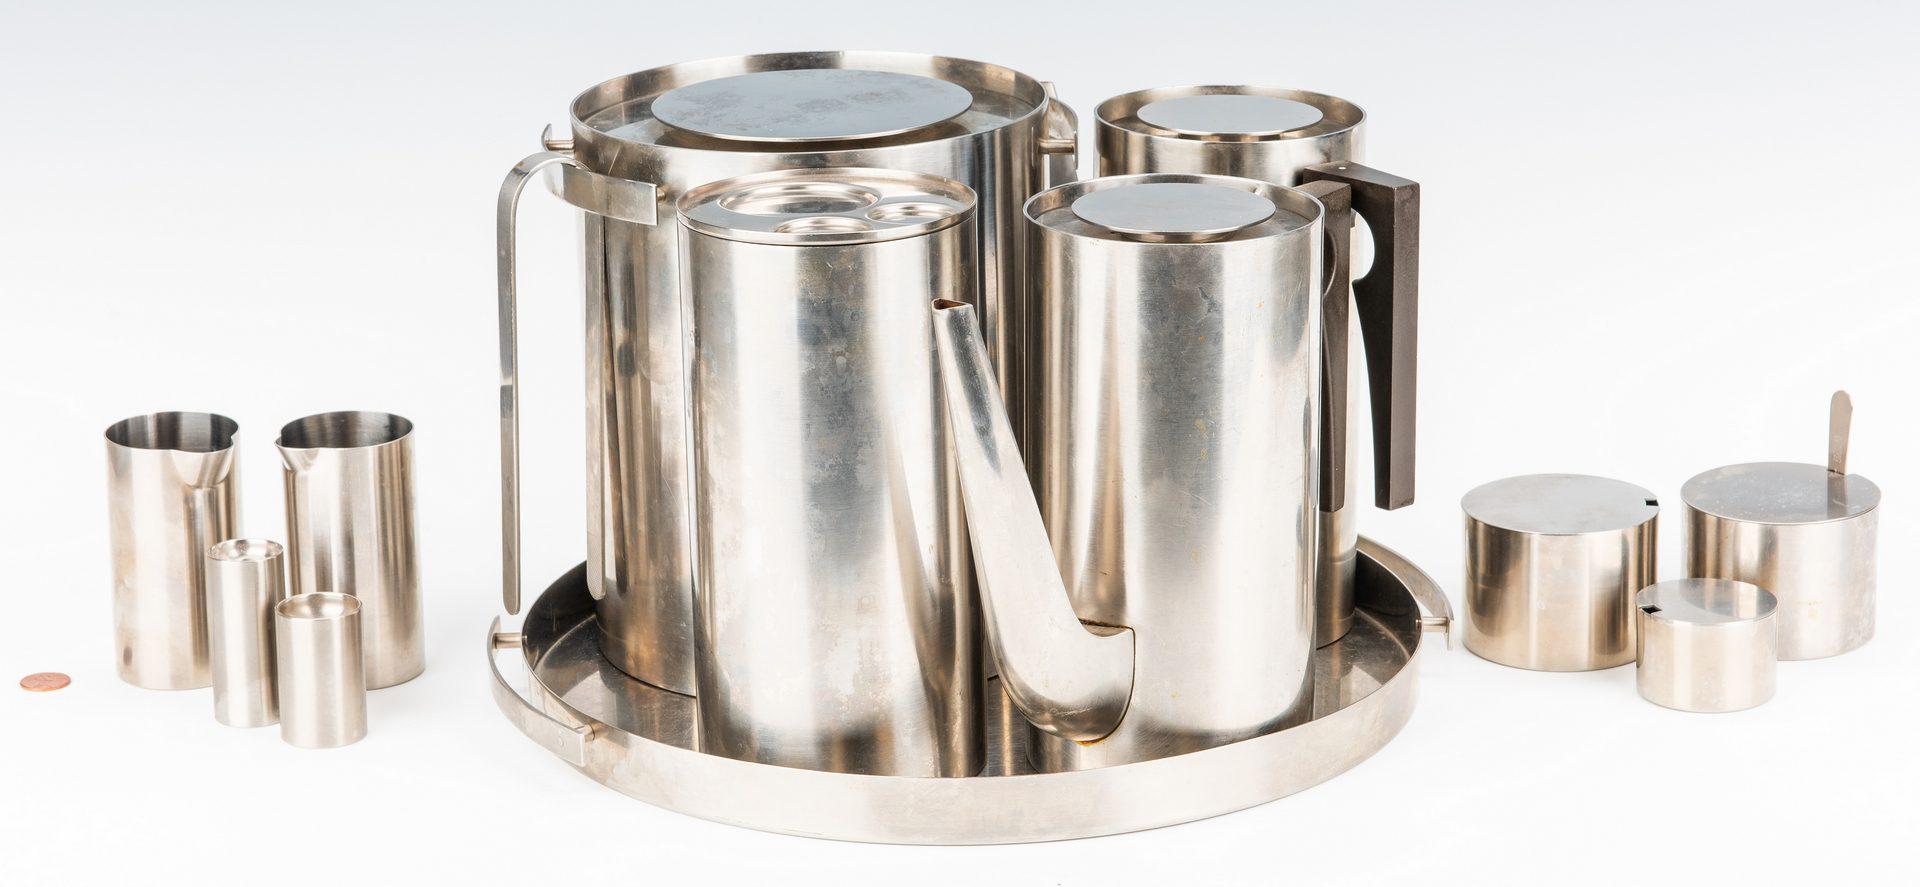 Lot 600: Mid-Century Arne Jacobsen Cylinda-line Group